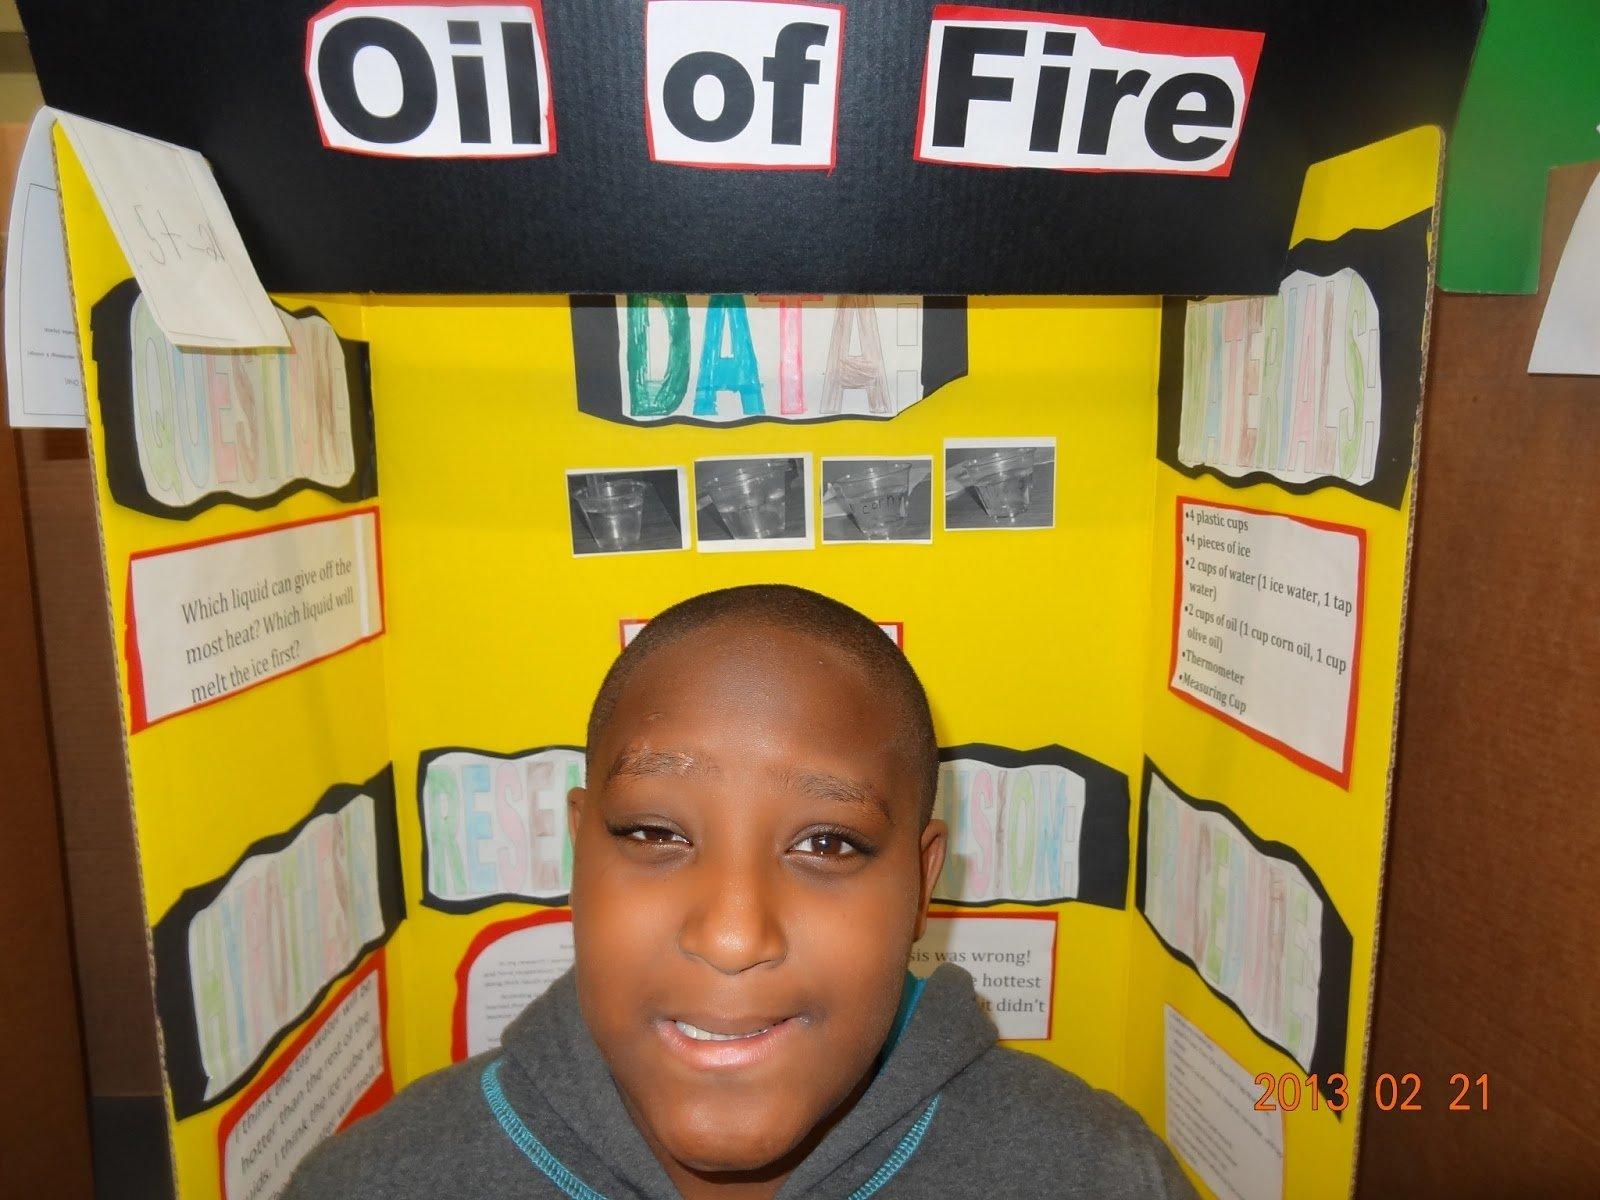 10 Pretty Science Fair Ideas For 8Th Grade nokw woodwork 5th grade 8th grade science fair projects info 49 2020